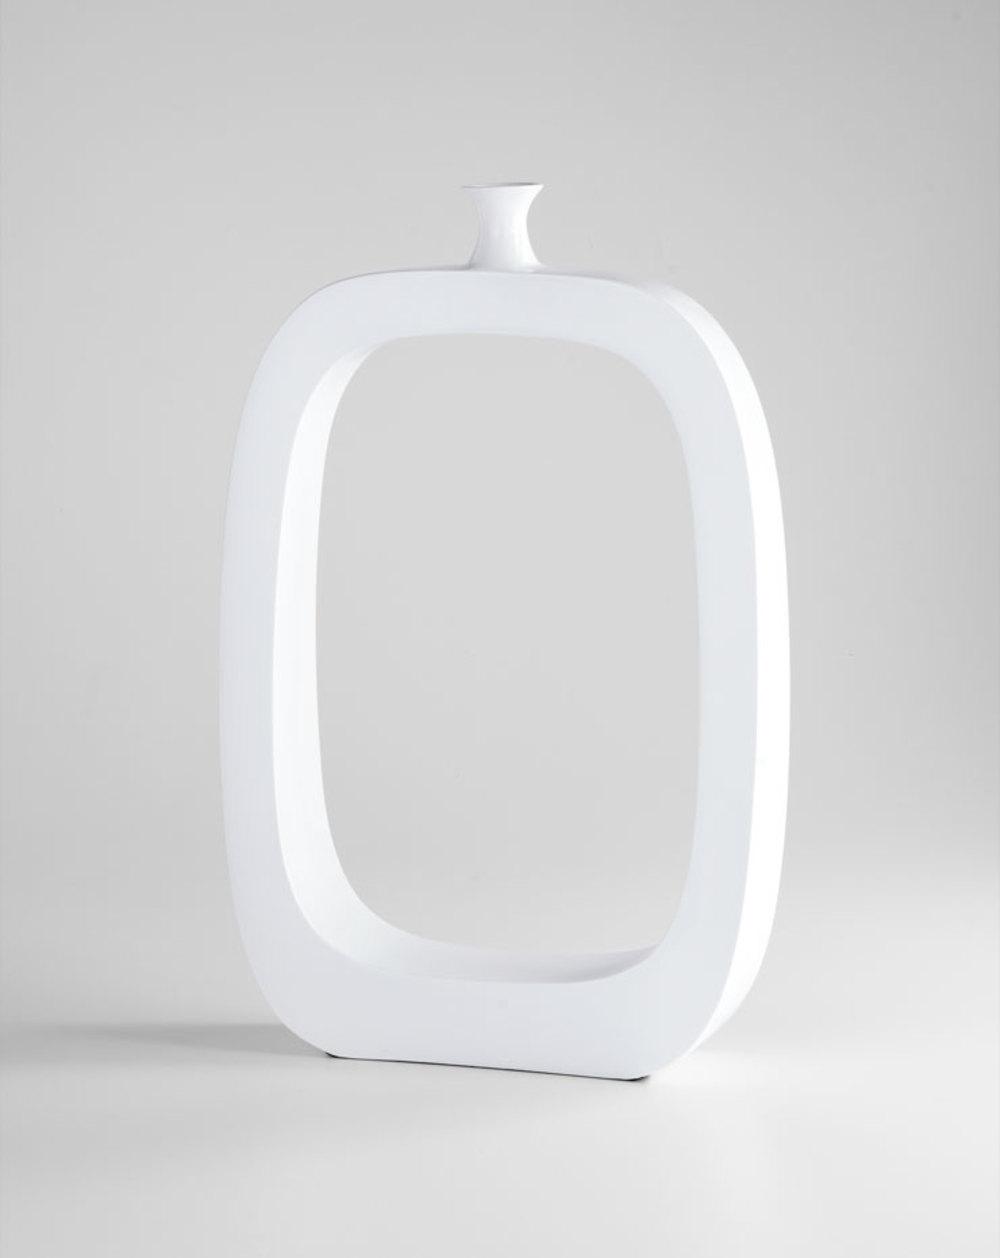 Cyan Designs - Large Beyond the Pale Vase